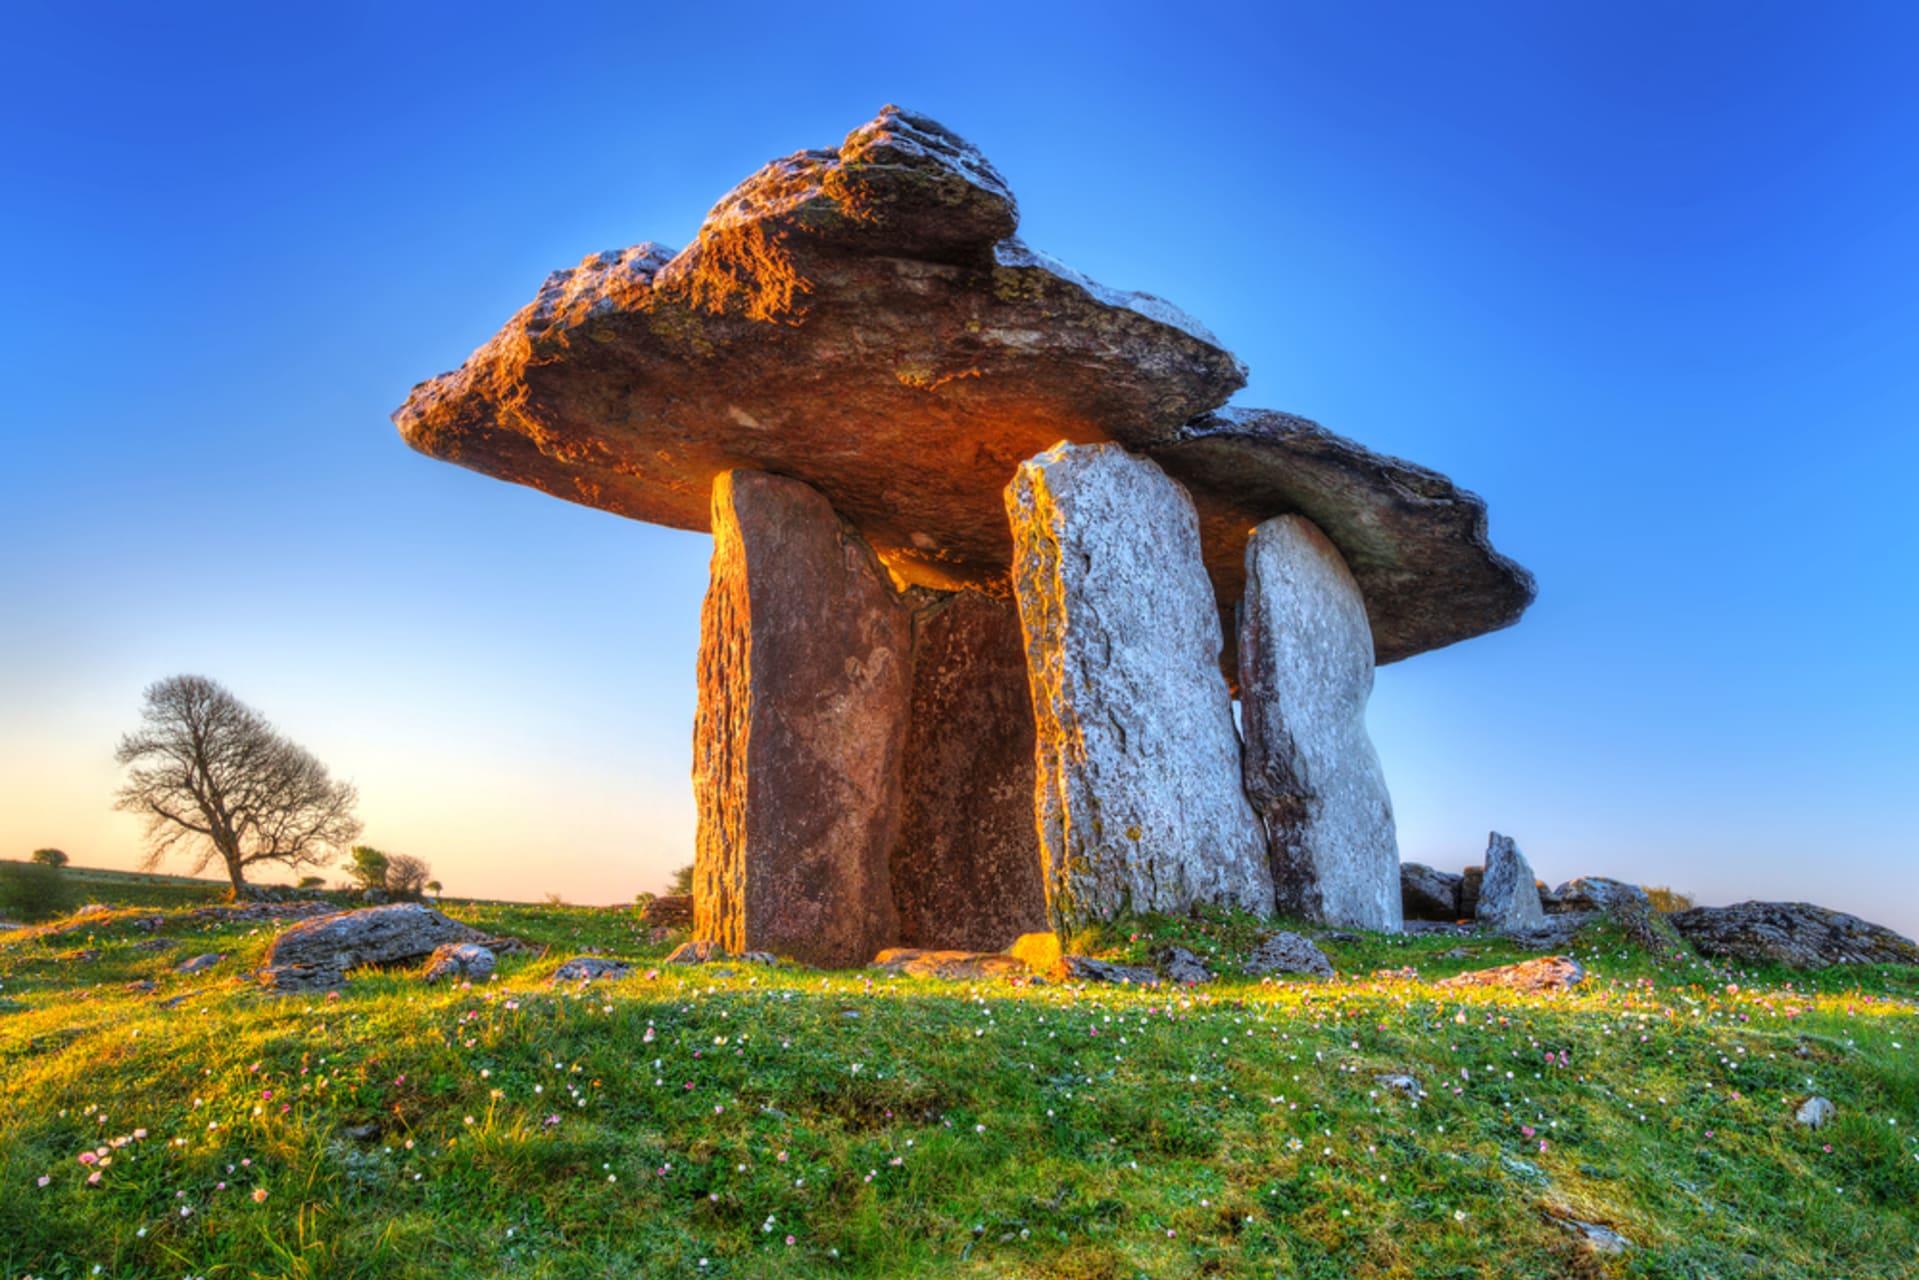 West of Ireland - Poulnabrone - Portal to Ireland 5,500 years ago